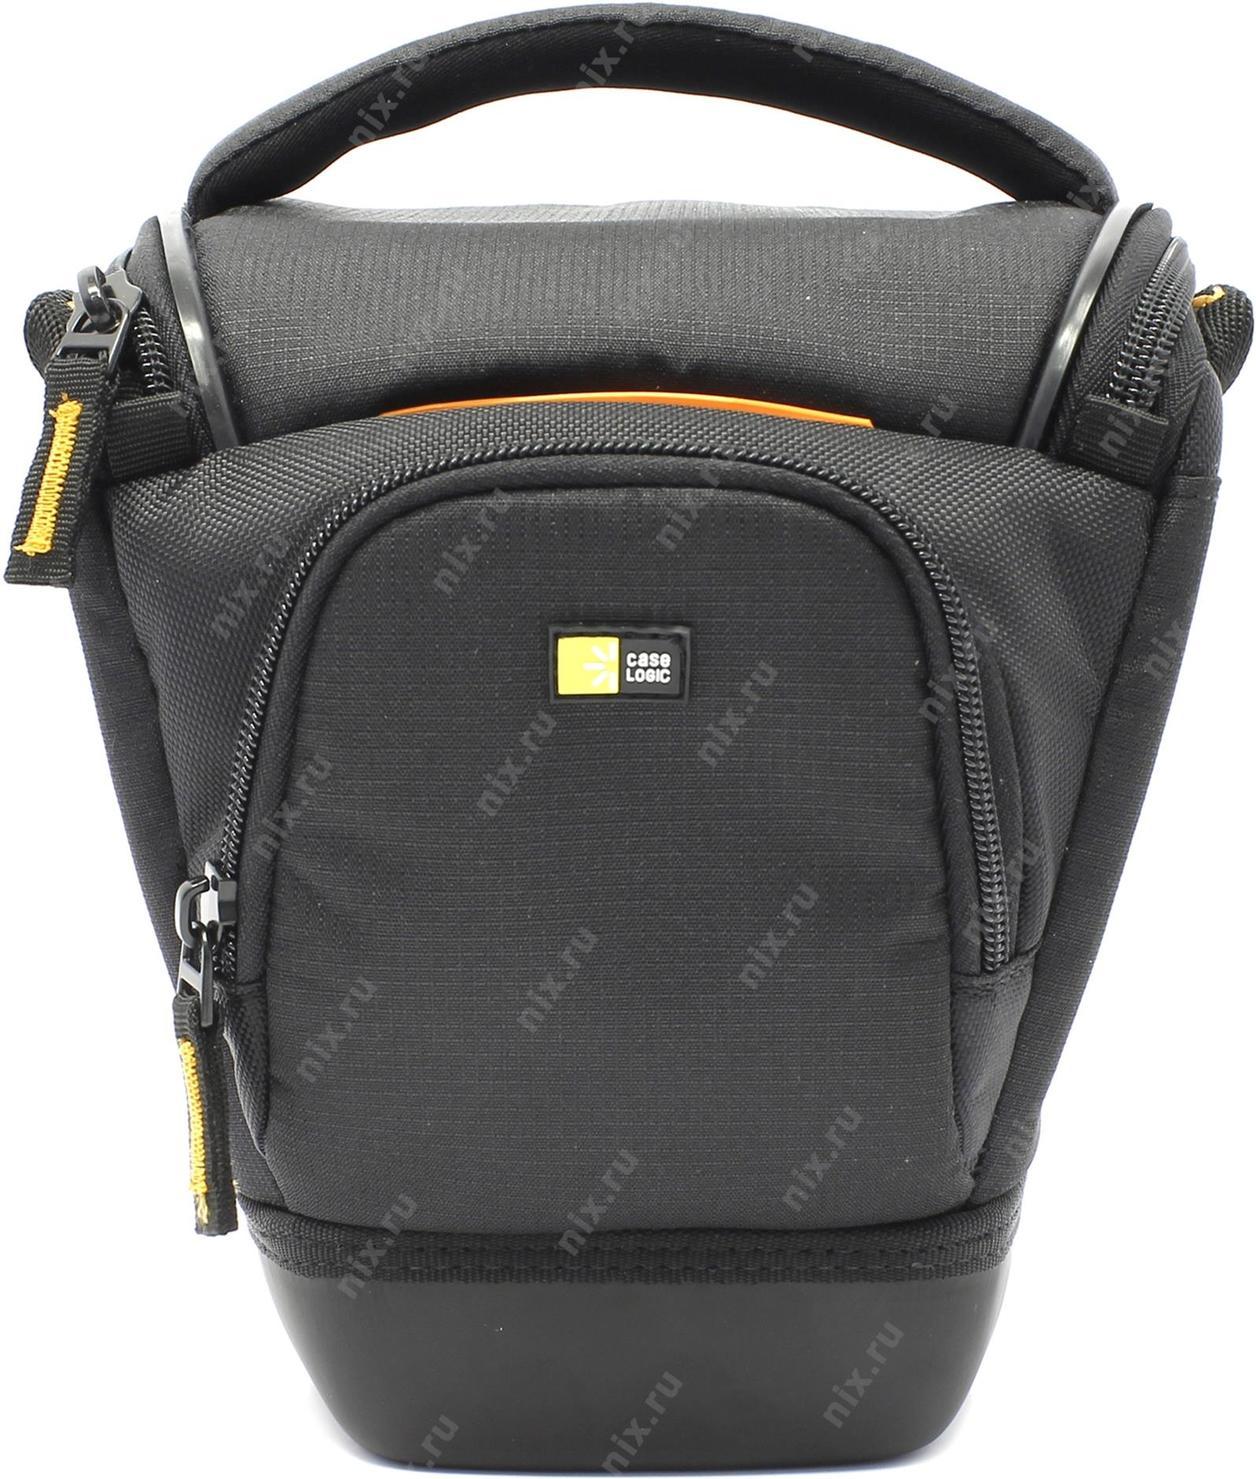 ae7dc1d93db2 Сумка для фотоаппарата Case Logic SLRC200 Black — купить в городе ТУЛА